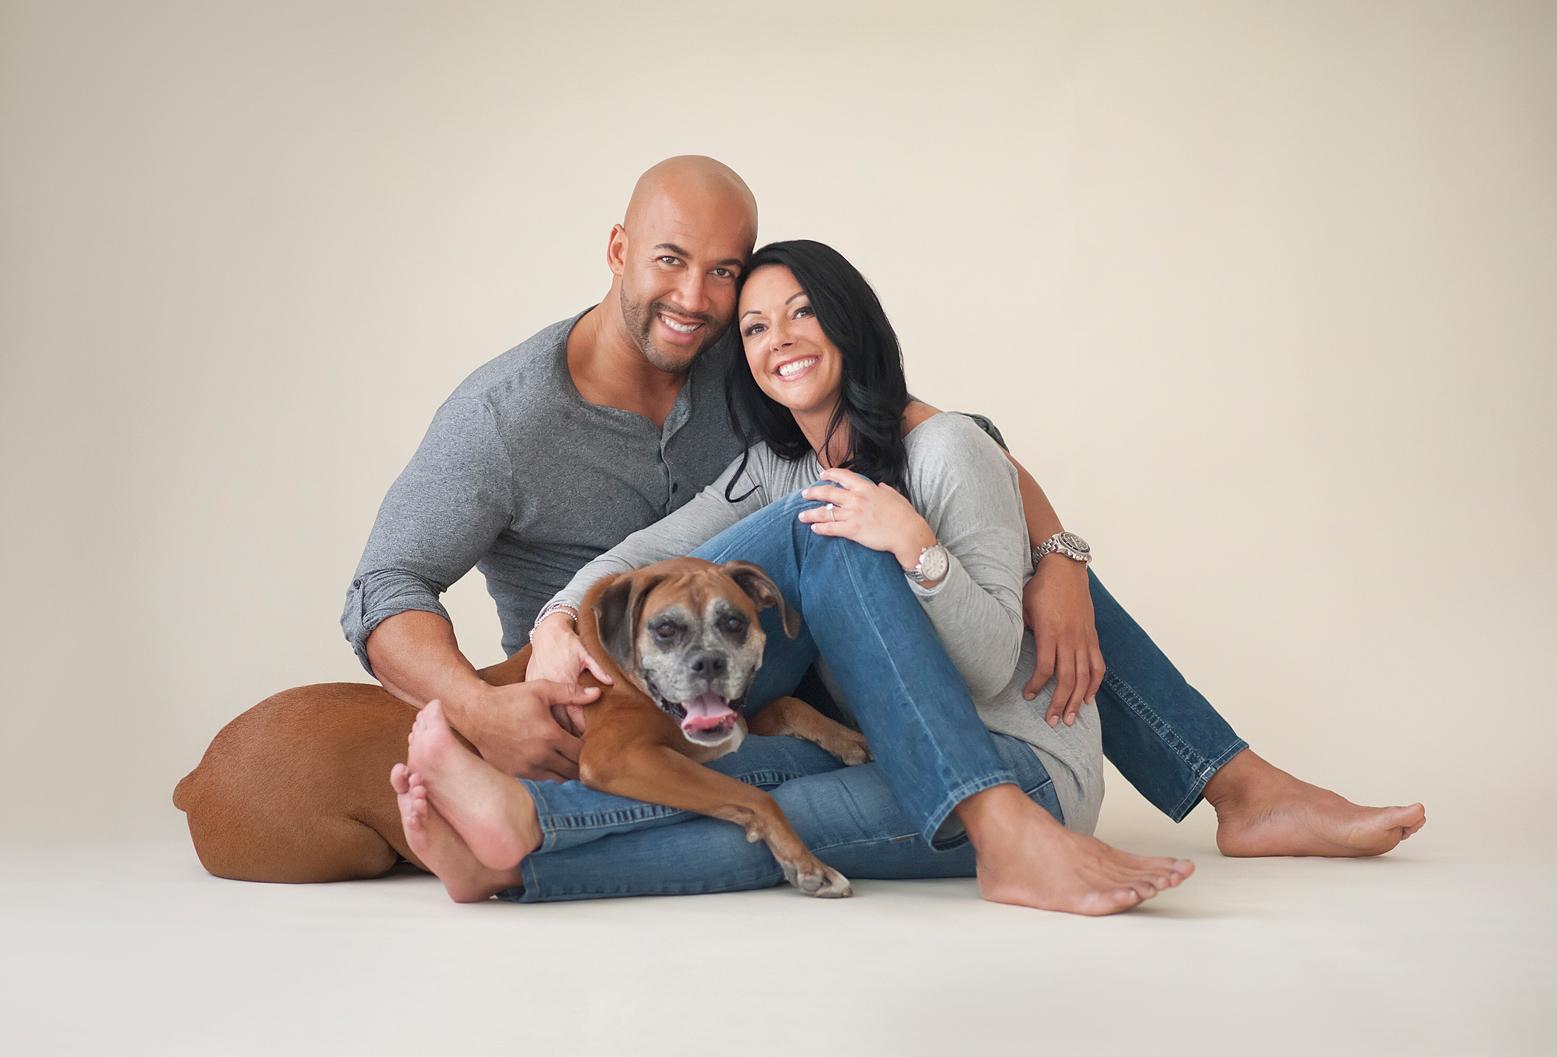 10-comfortable-portrait-couple-dog-earth-tones.jpg